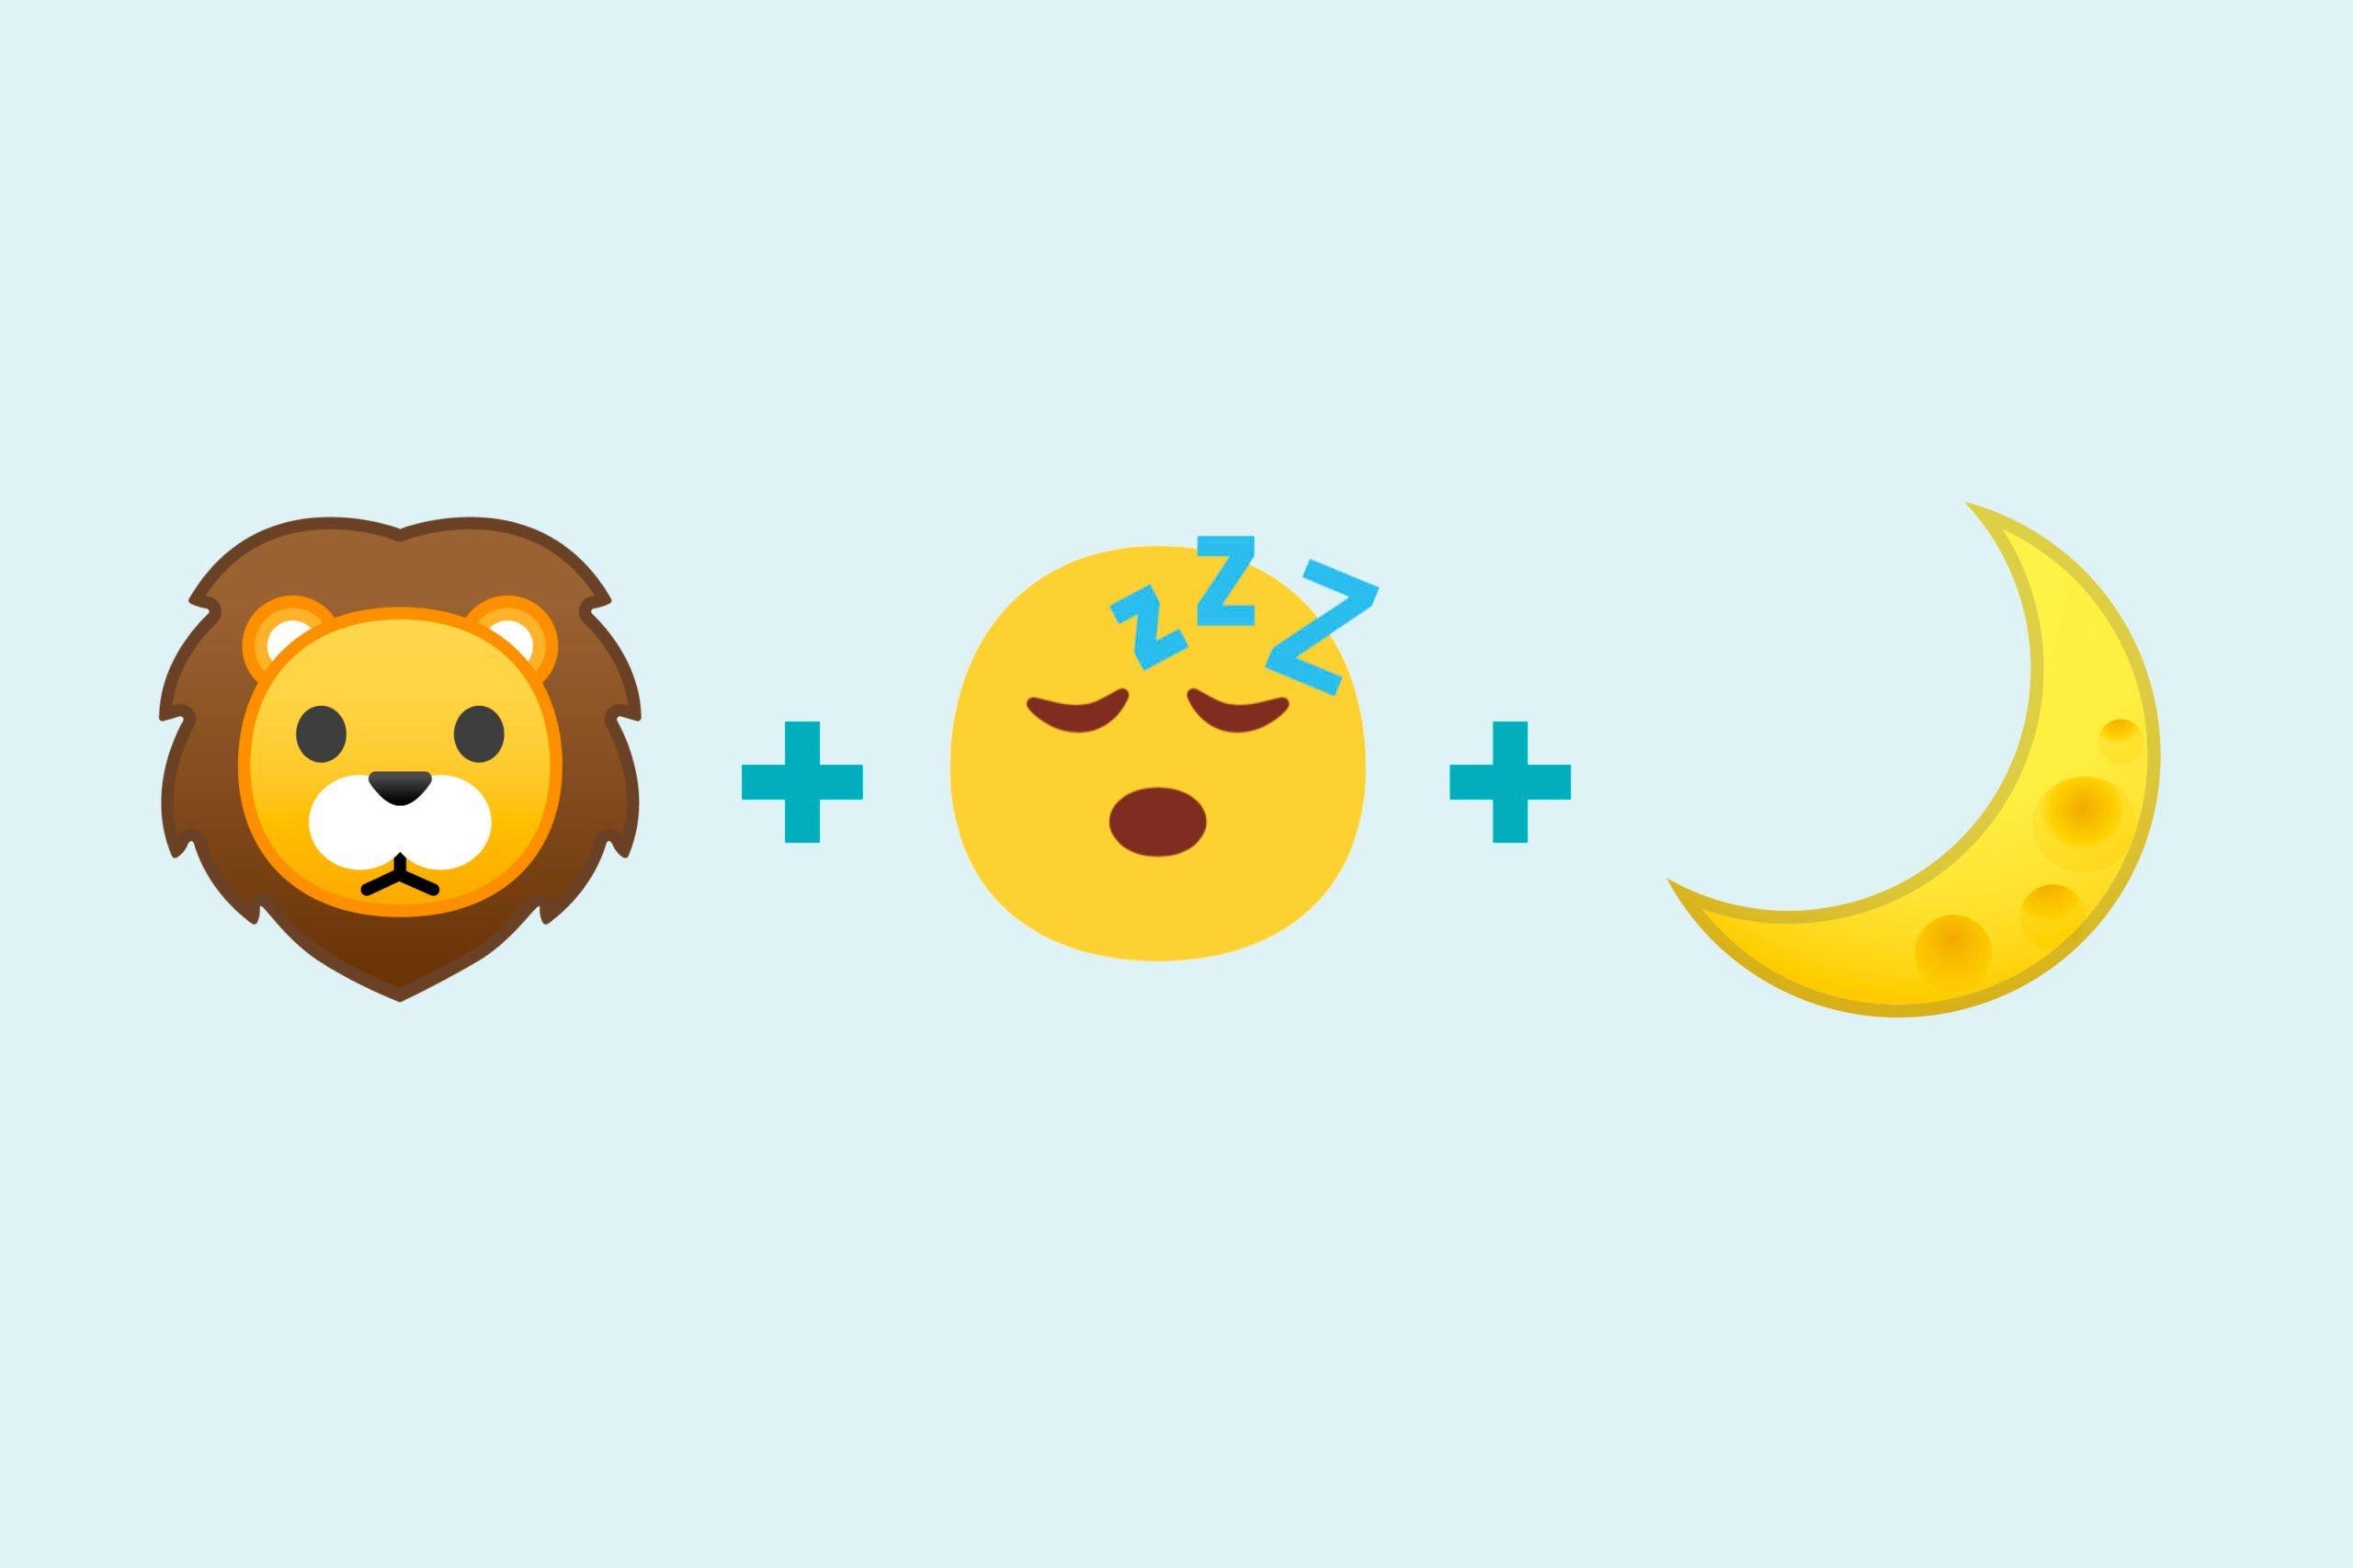 Lion emoji + sleeping emoji + night emoji